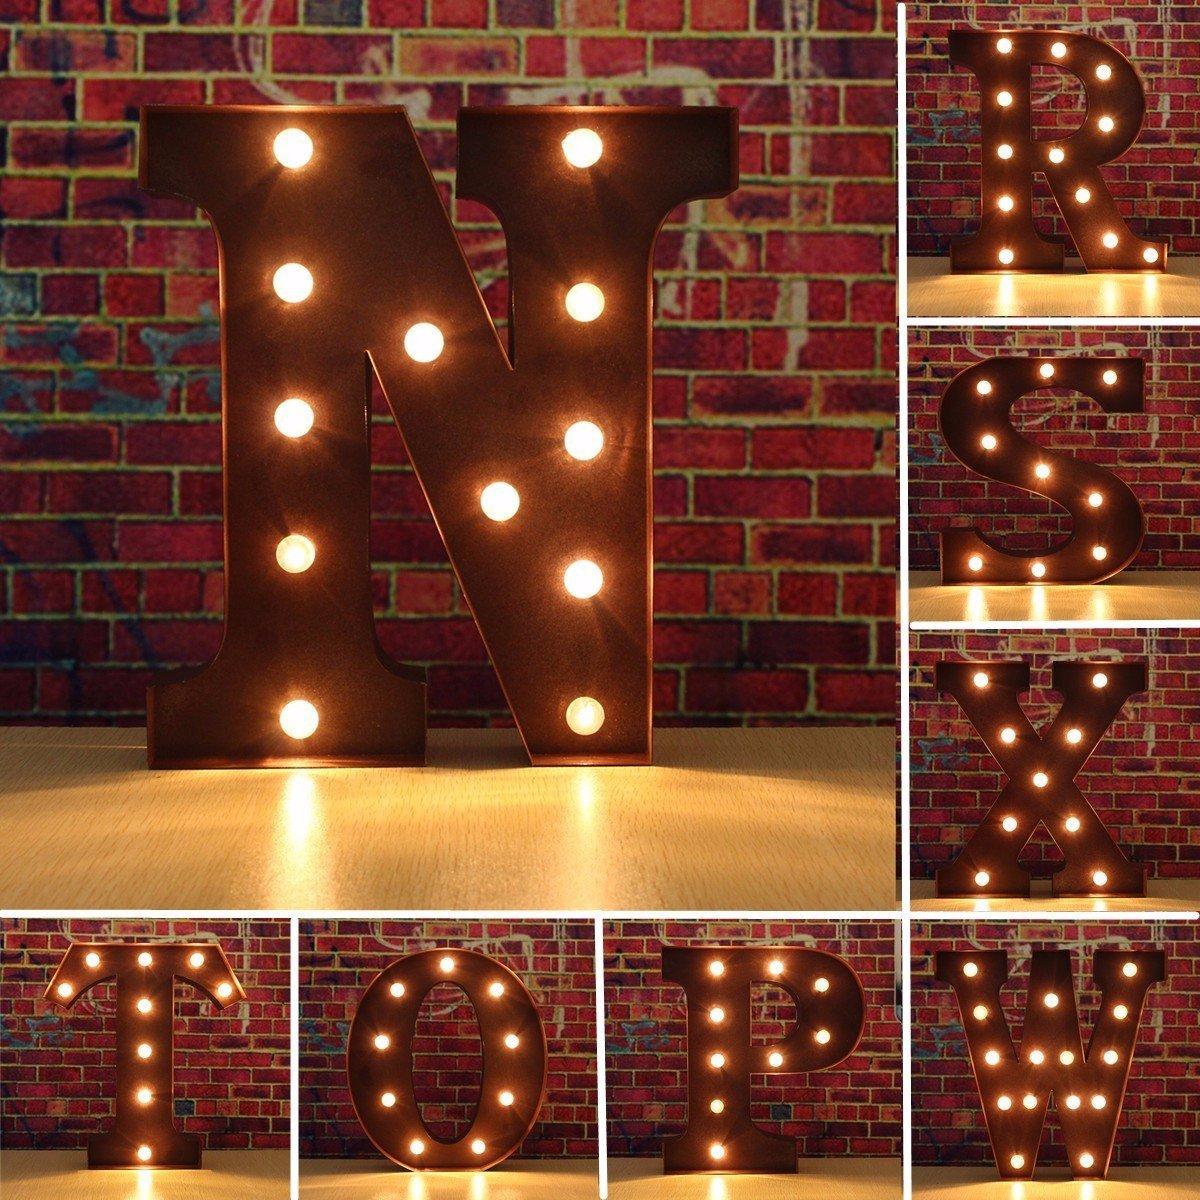 SOLMORE 23CM x 5.5CM LED Letter Light DIY Vintage Metal Sign Carnival Wall Marquee Lights Decoration G 6